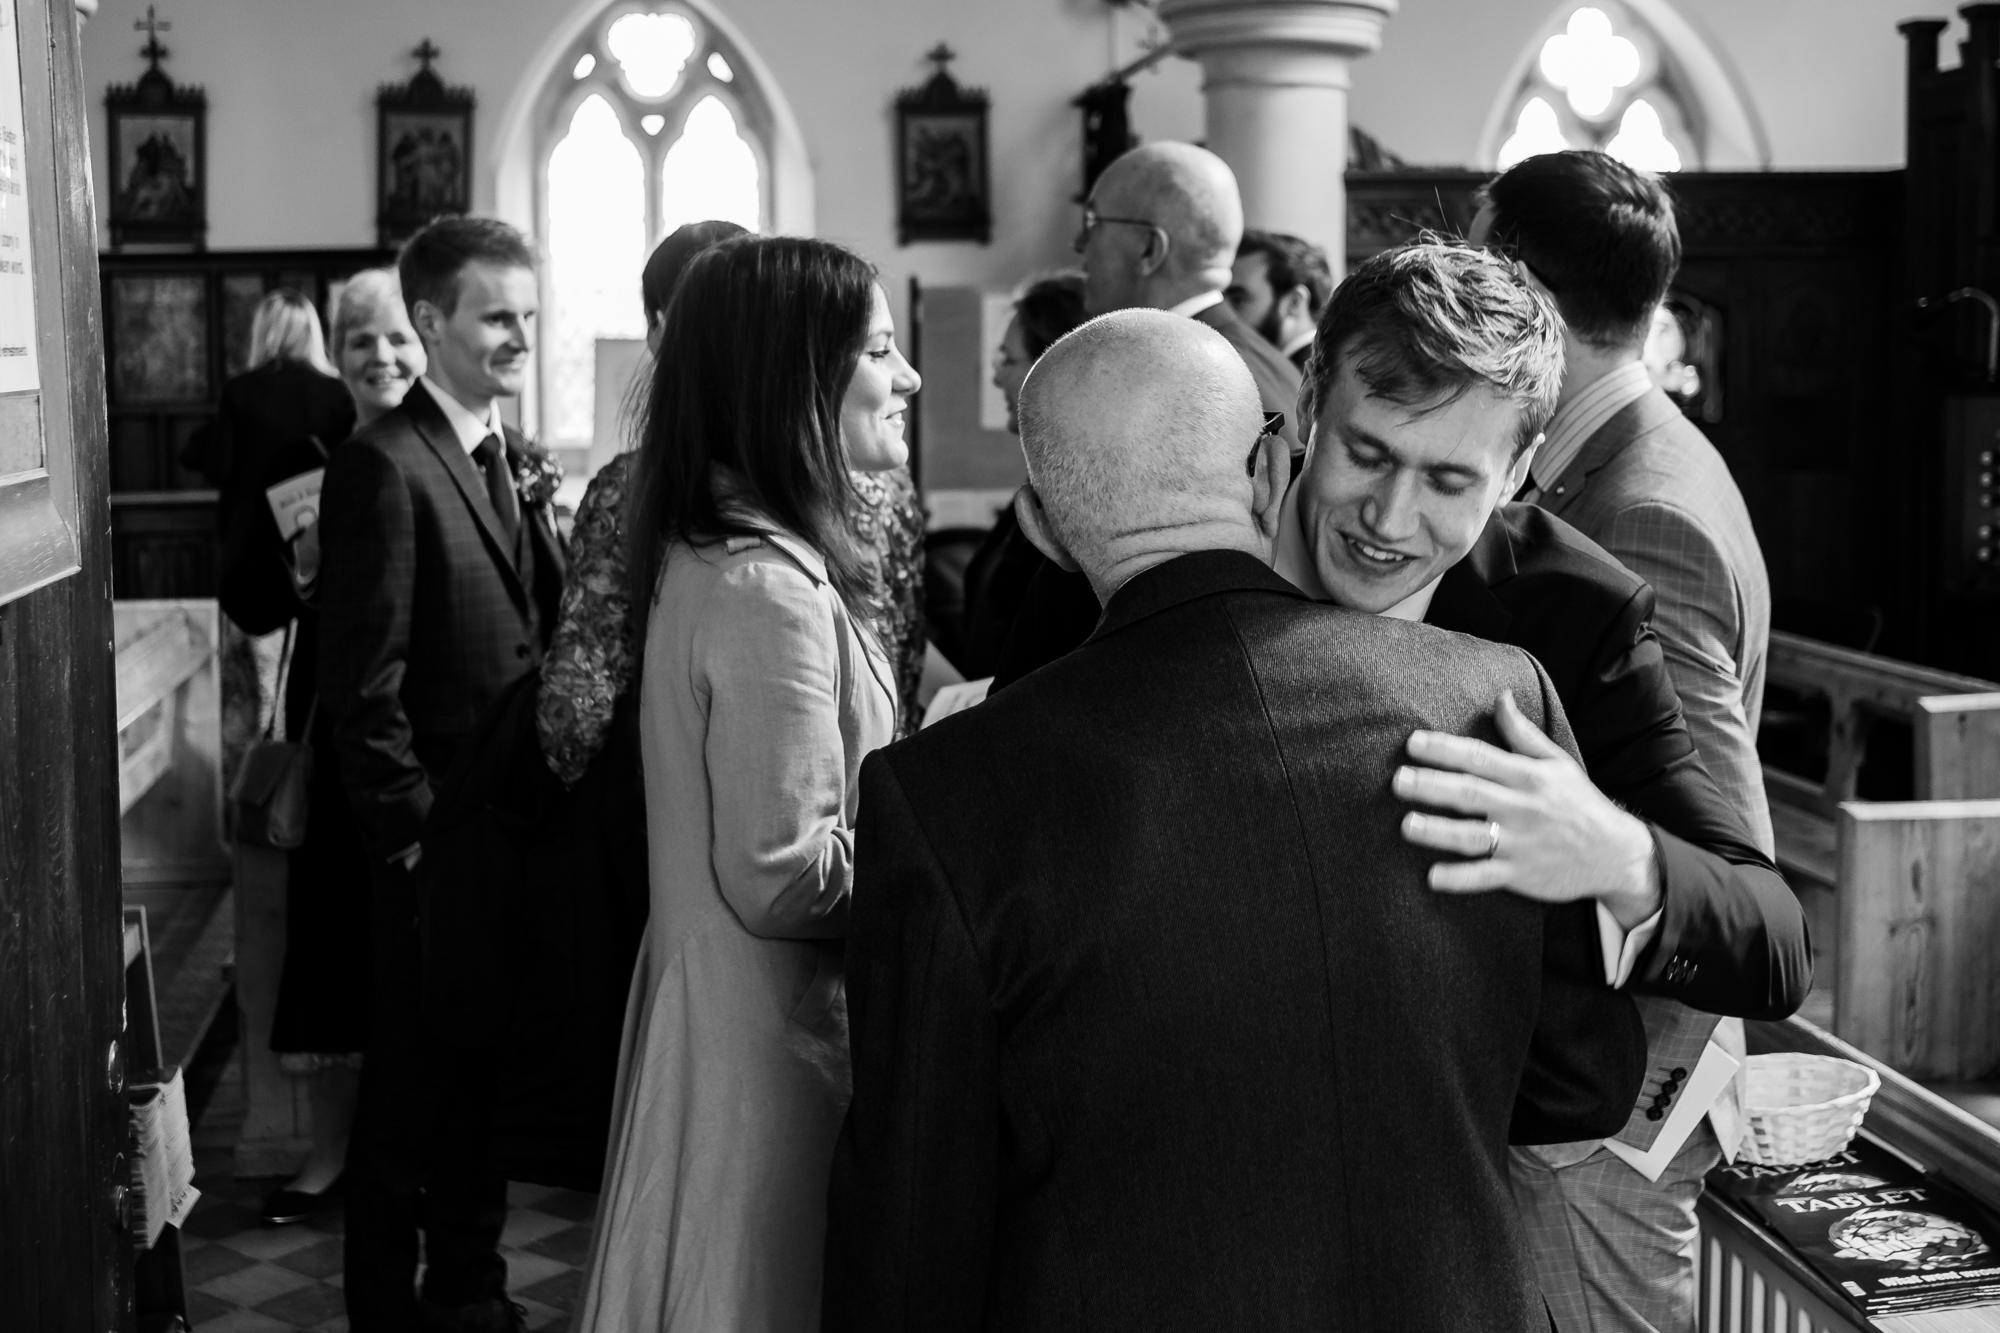 Katie and Dode weddings (20 of 207).jpg